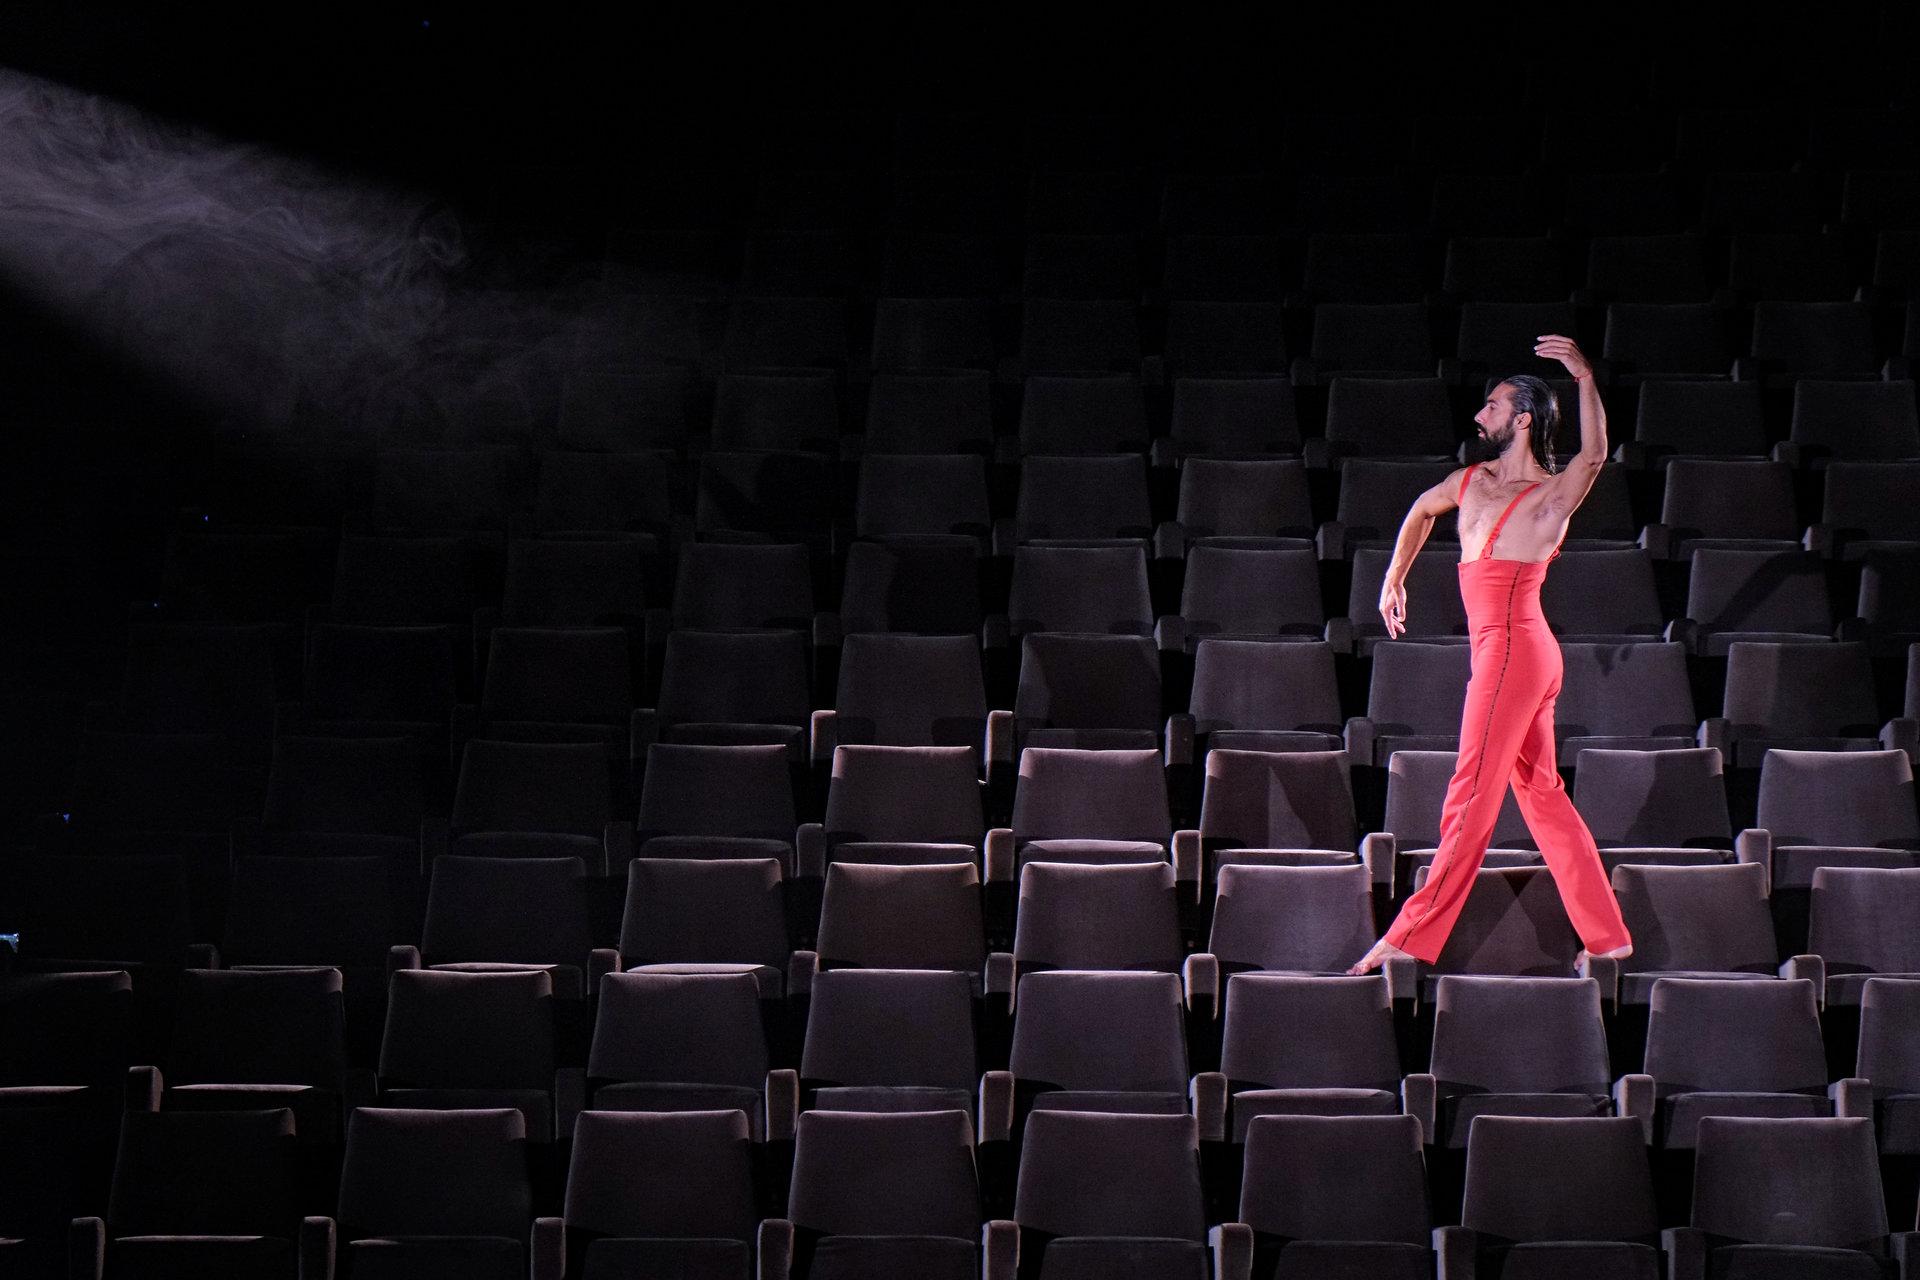 Photo in On stage | Author Даниел Дончов - grafarena | PHOTO FORUM